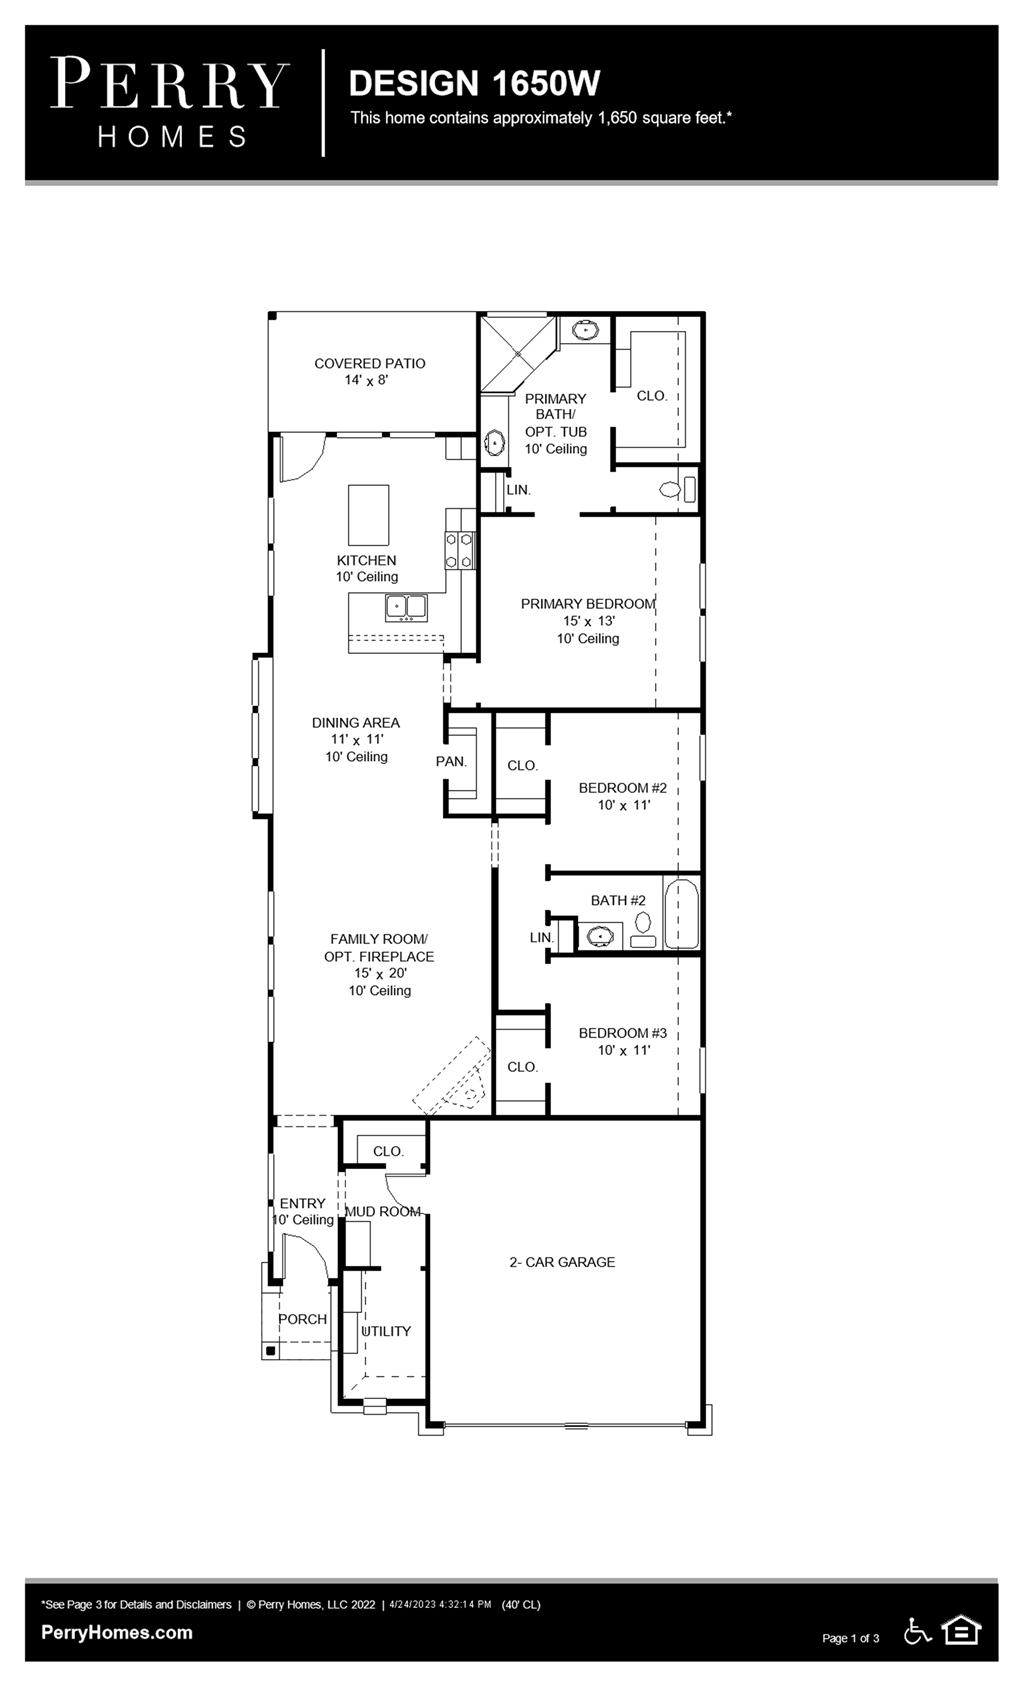 Floor Plan for 1650W